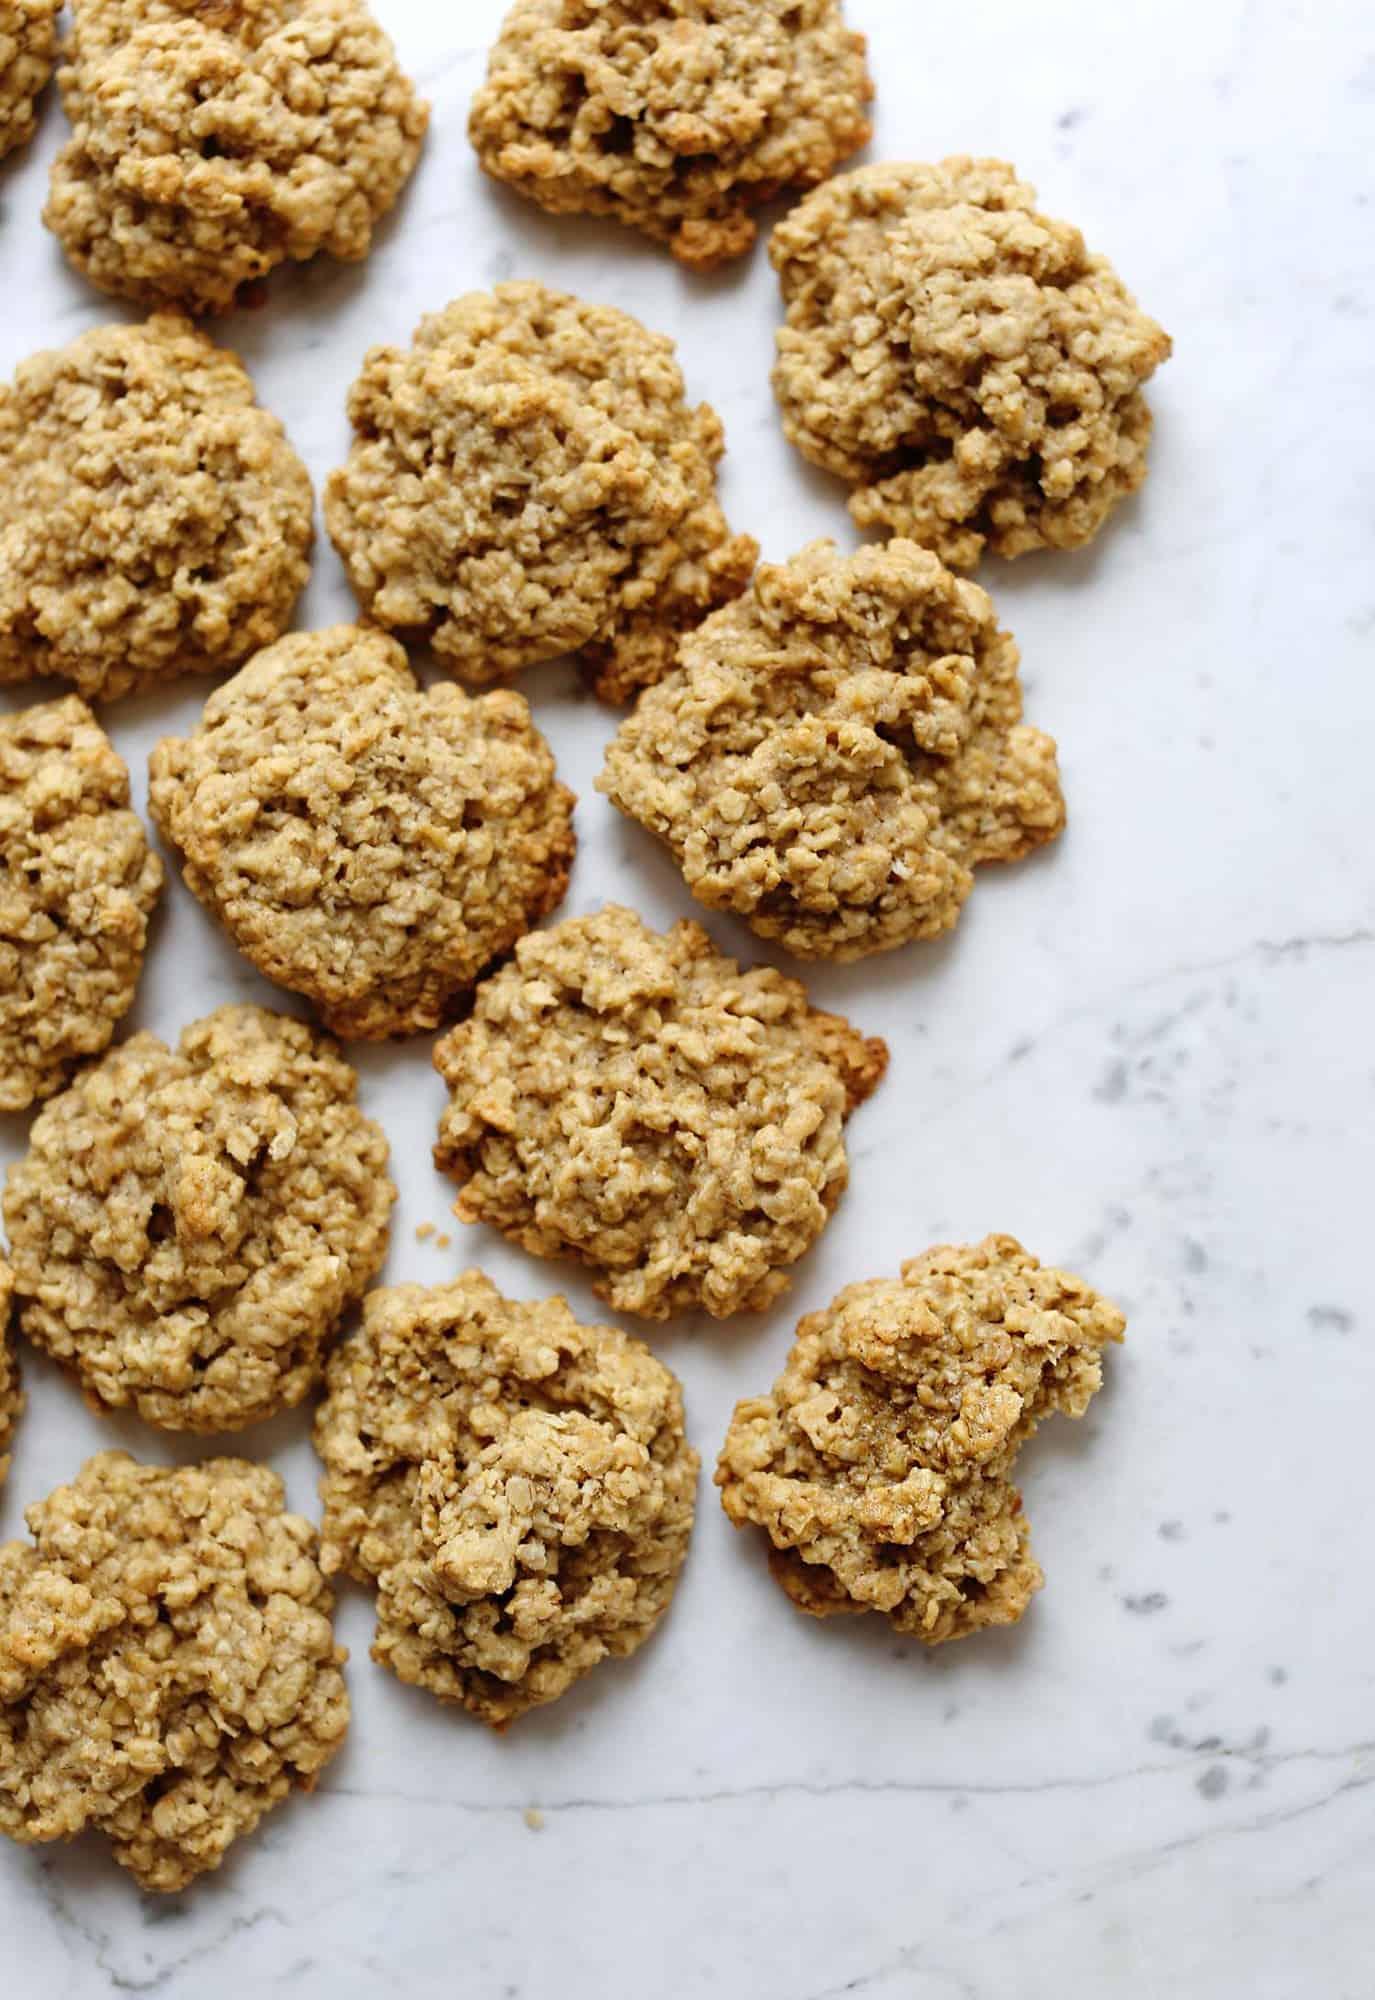 Lisa's Basic Oatmeal Cookies